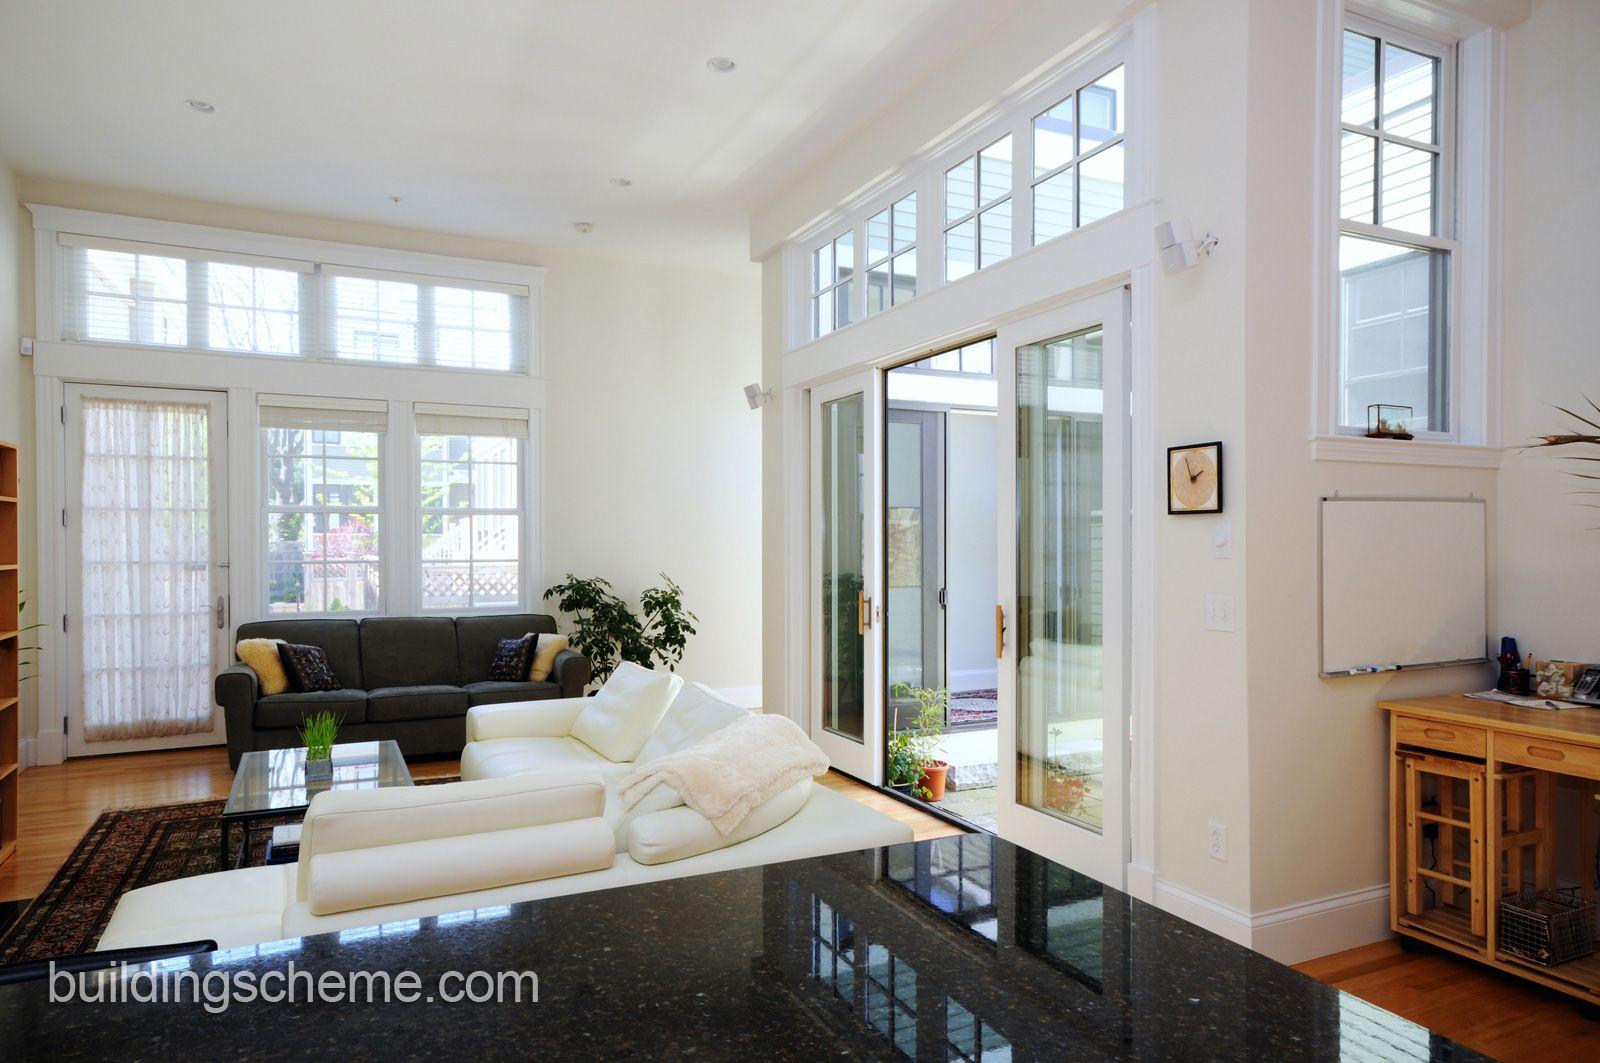 Black and White Contemporary Interior Design Ideas for your Dream ...